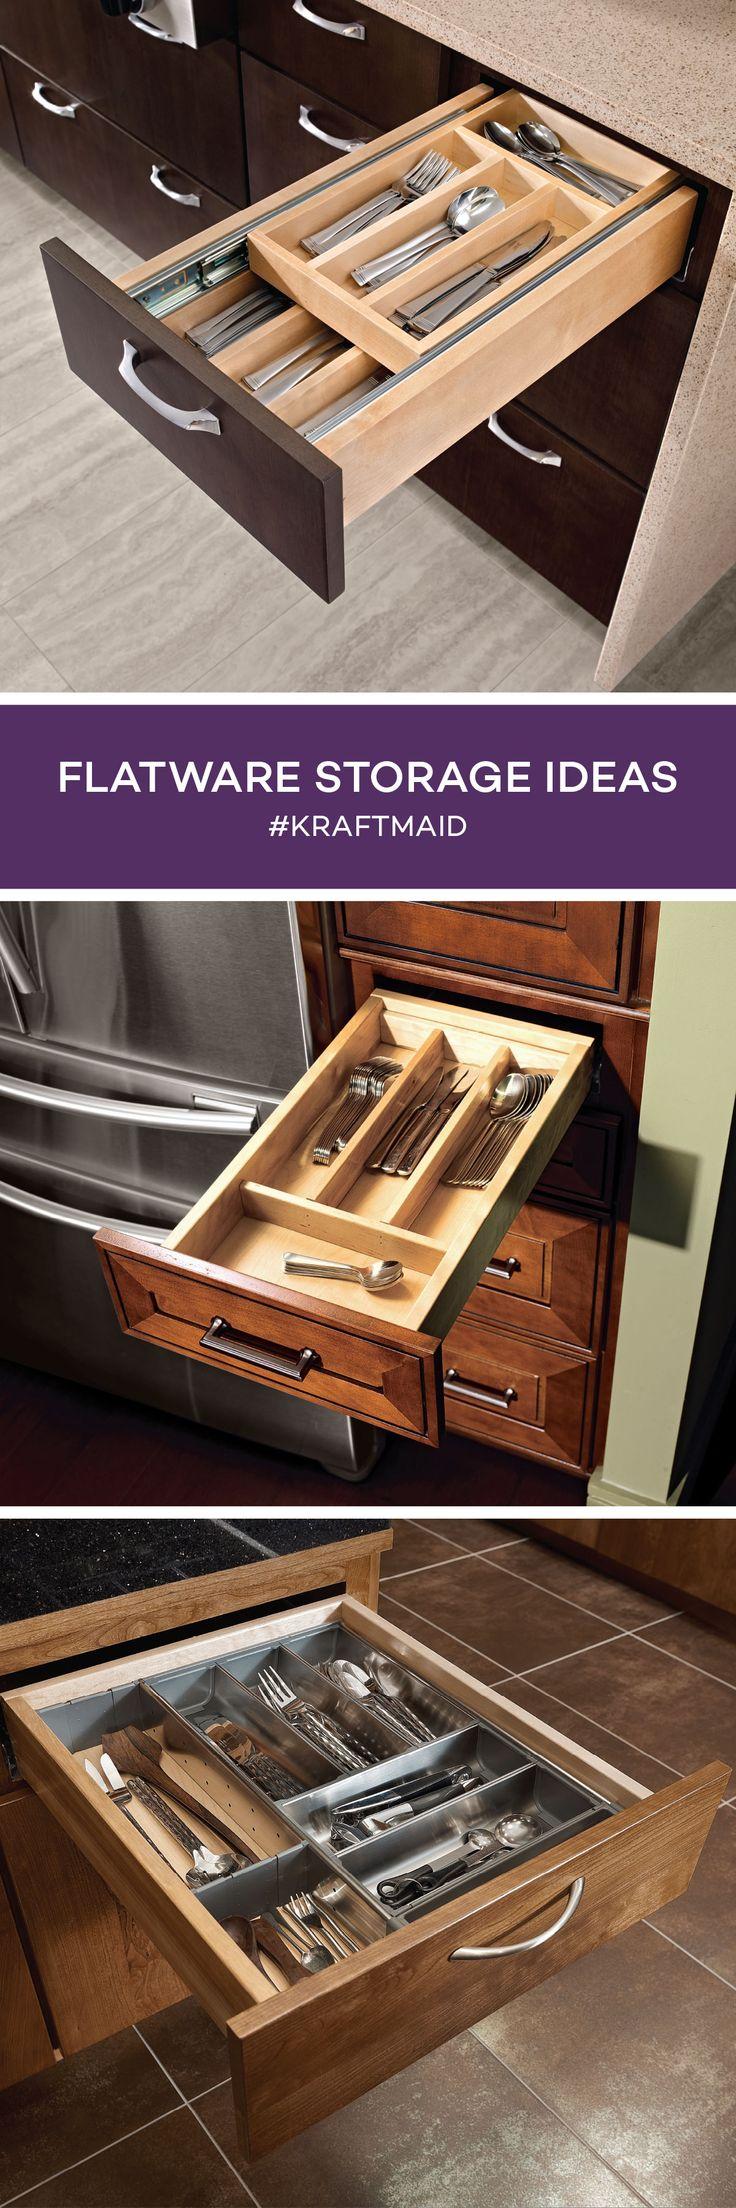 25 best Kitchen ideas images on Pinterest | Kitchen ideas, Kitchen ...